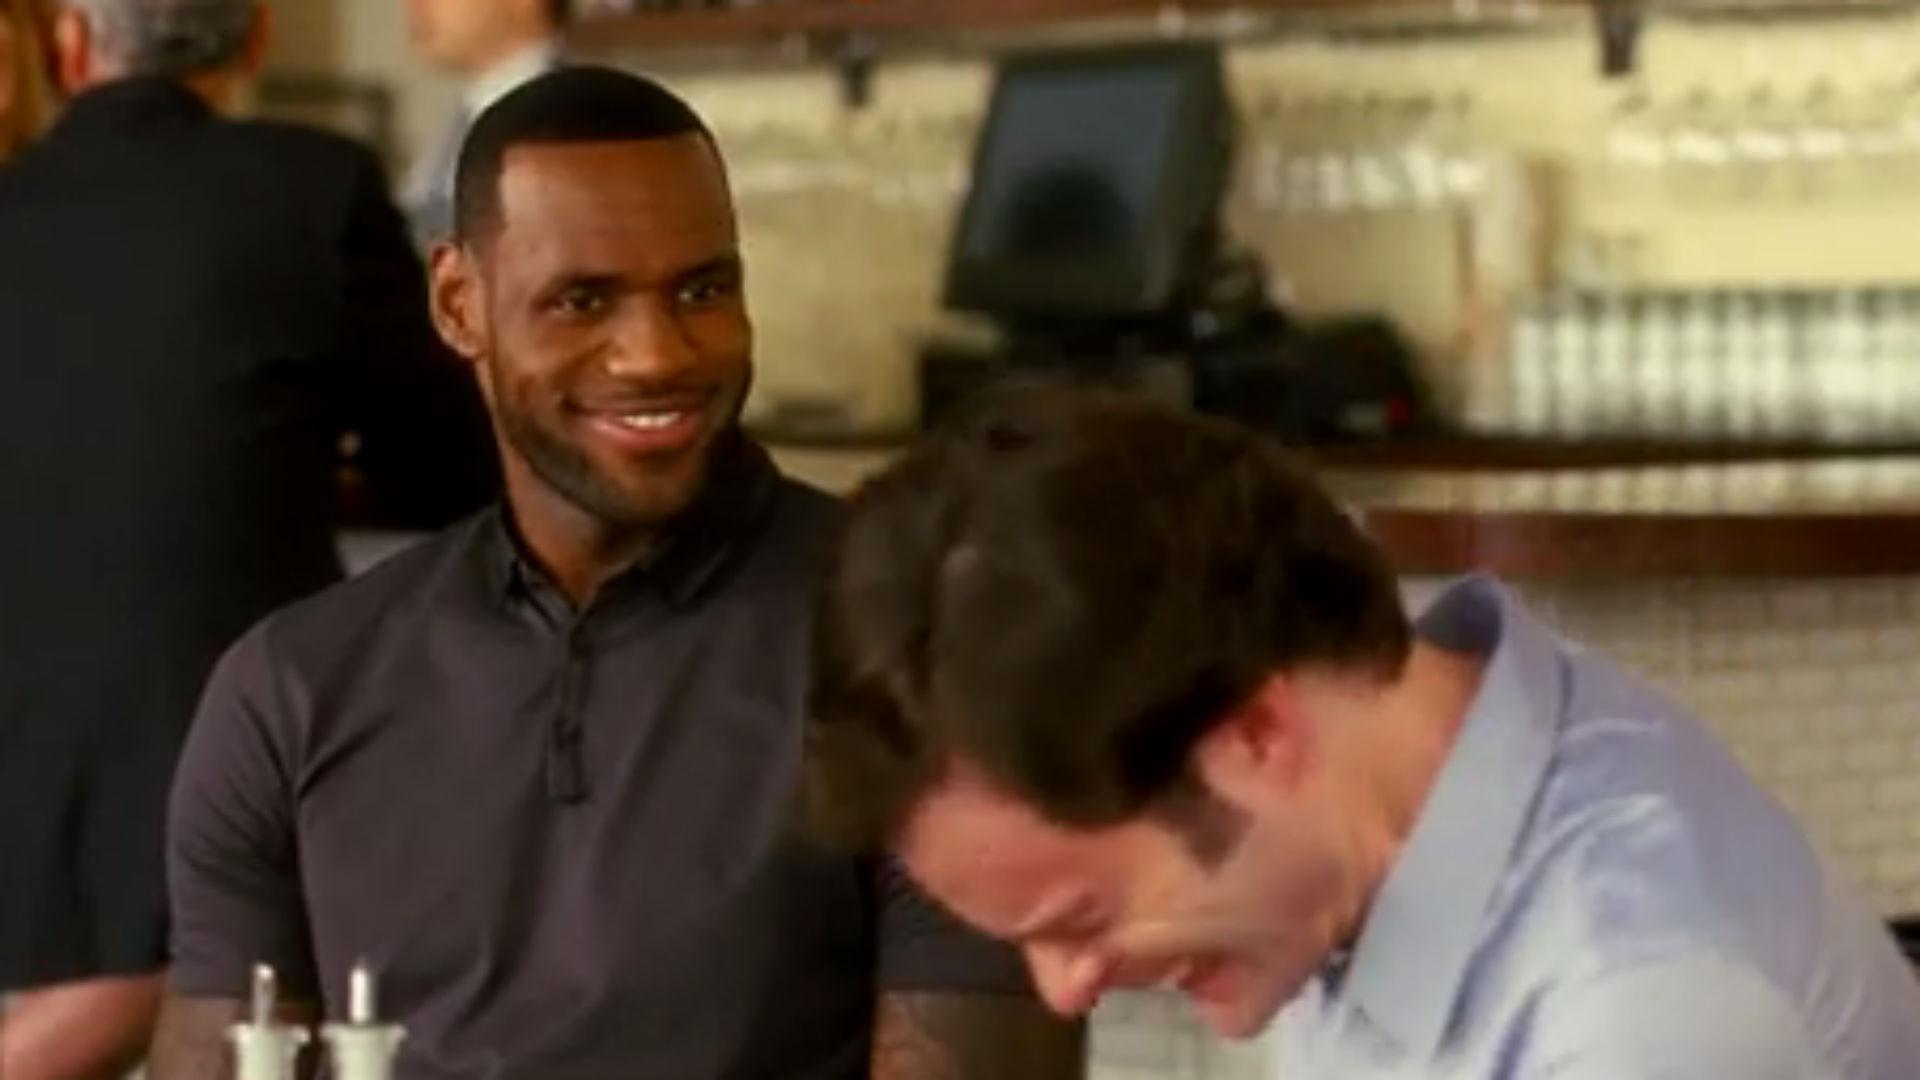 LeBron James cracks up in 'Trainwreck' gag reel